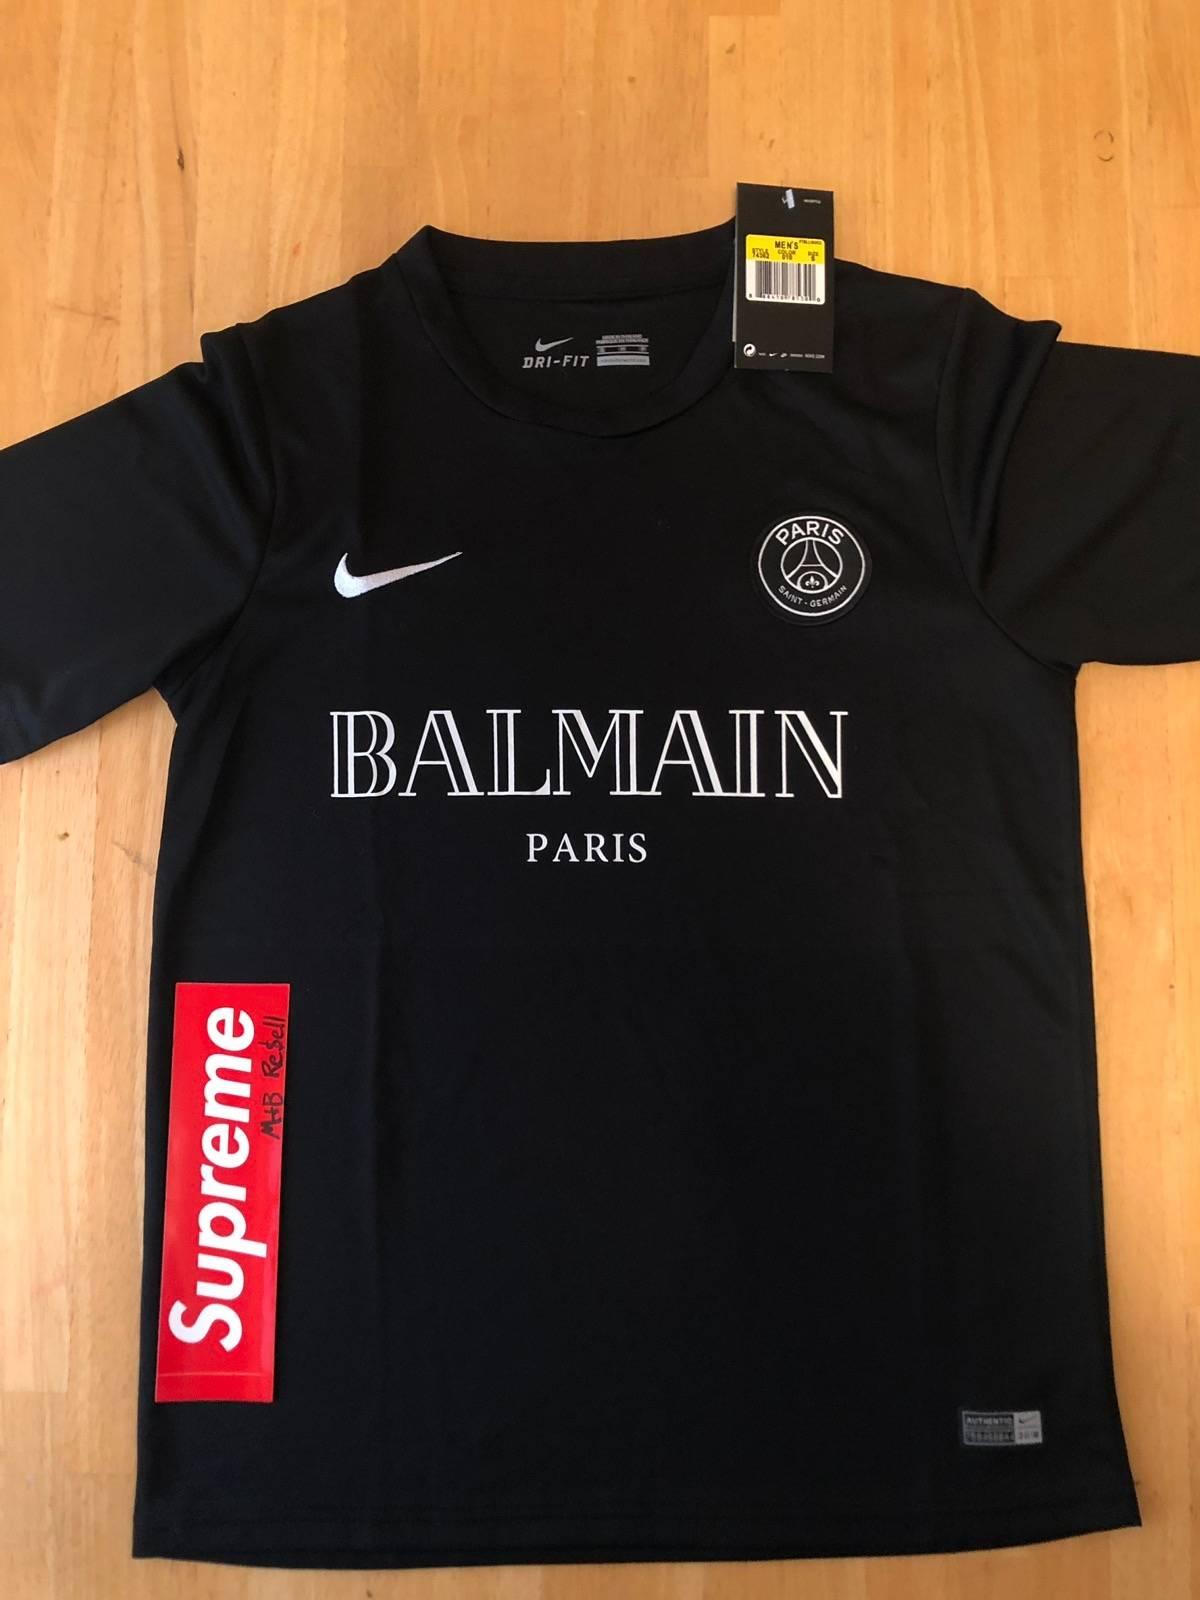 d5ba4ef5b Balmain Nike Paris Saint Germain x Balmain Jersey Size s - Short Sleeve  T-Shirts for Sale - Grailed